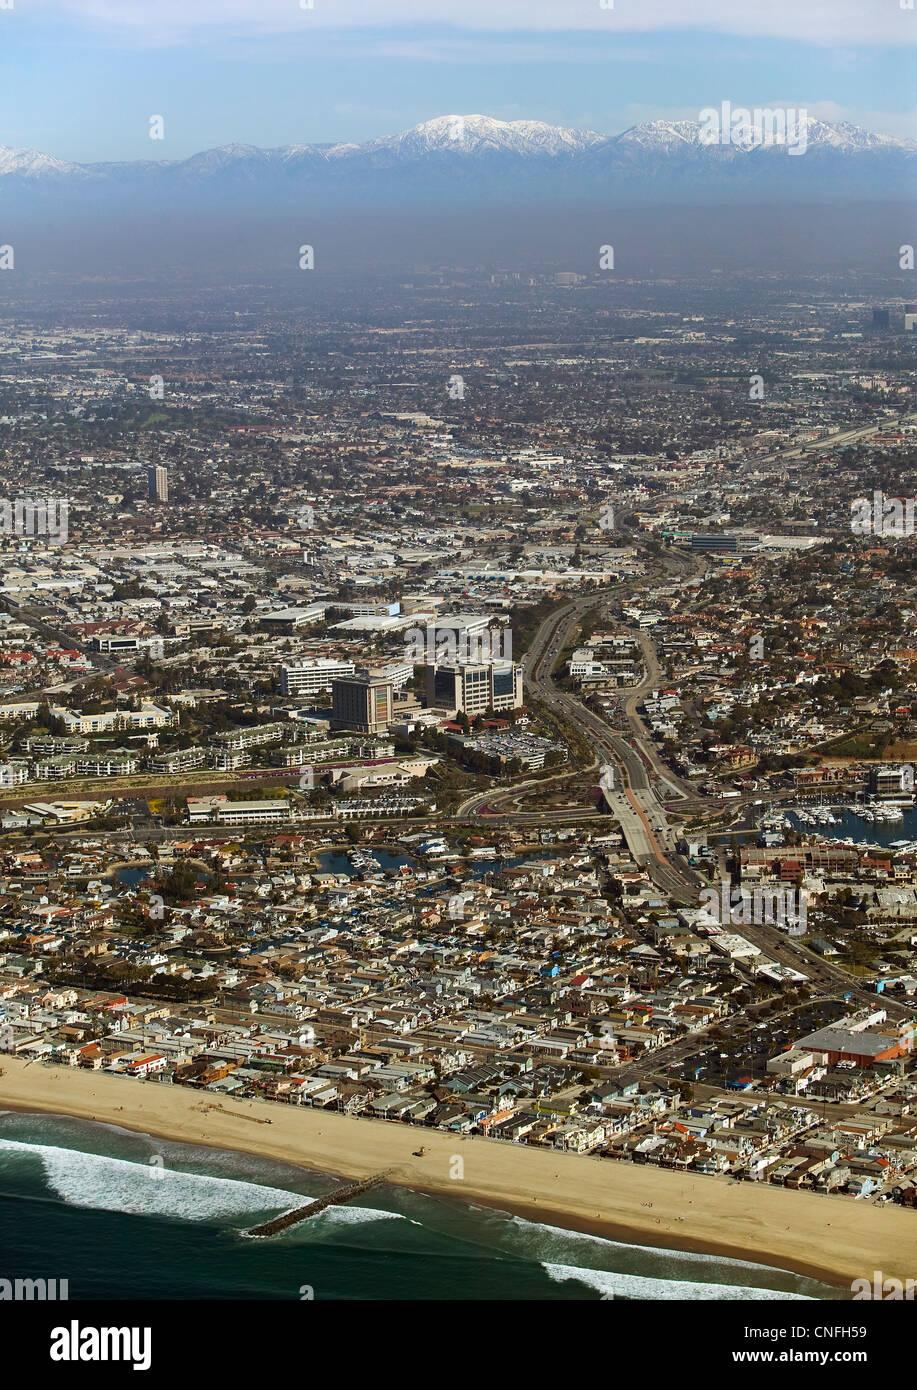 aerial photograph Orange County, California - Stock Image